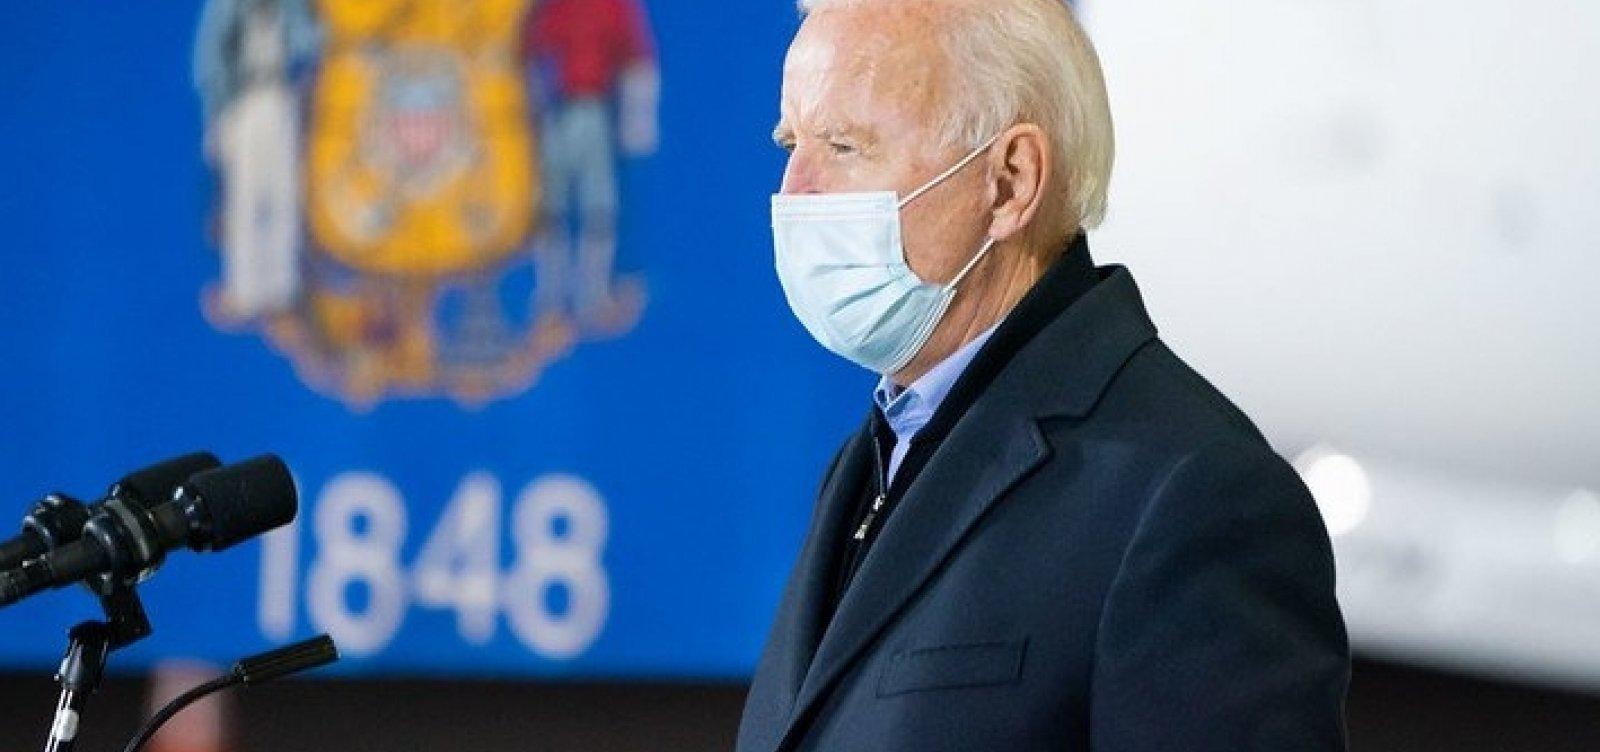 Posse de Biden terá segurança reforçada